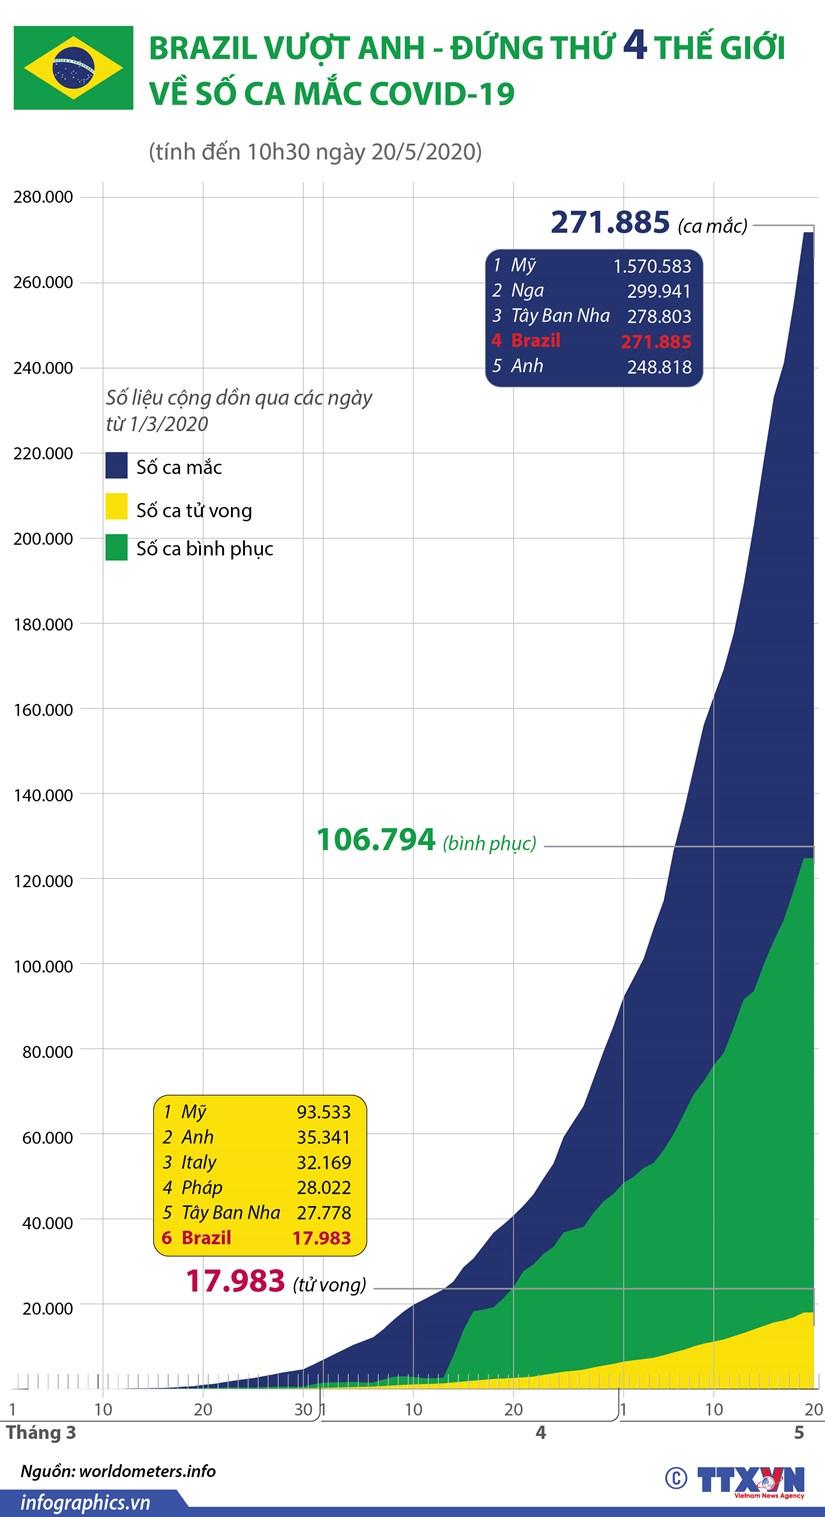 [Infographics] Brazil vuot Anh, dung thu 4 the gioi ve ca mac COVID-19 hinh anh 1